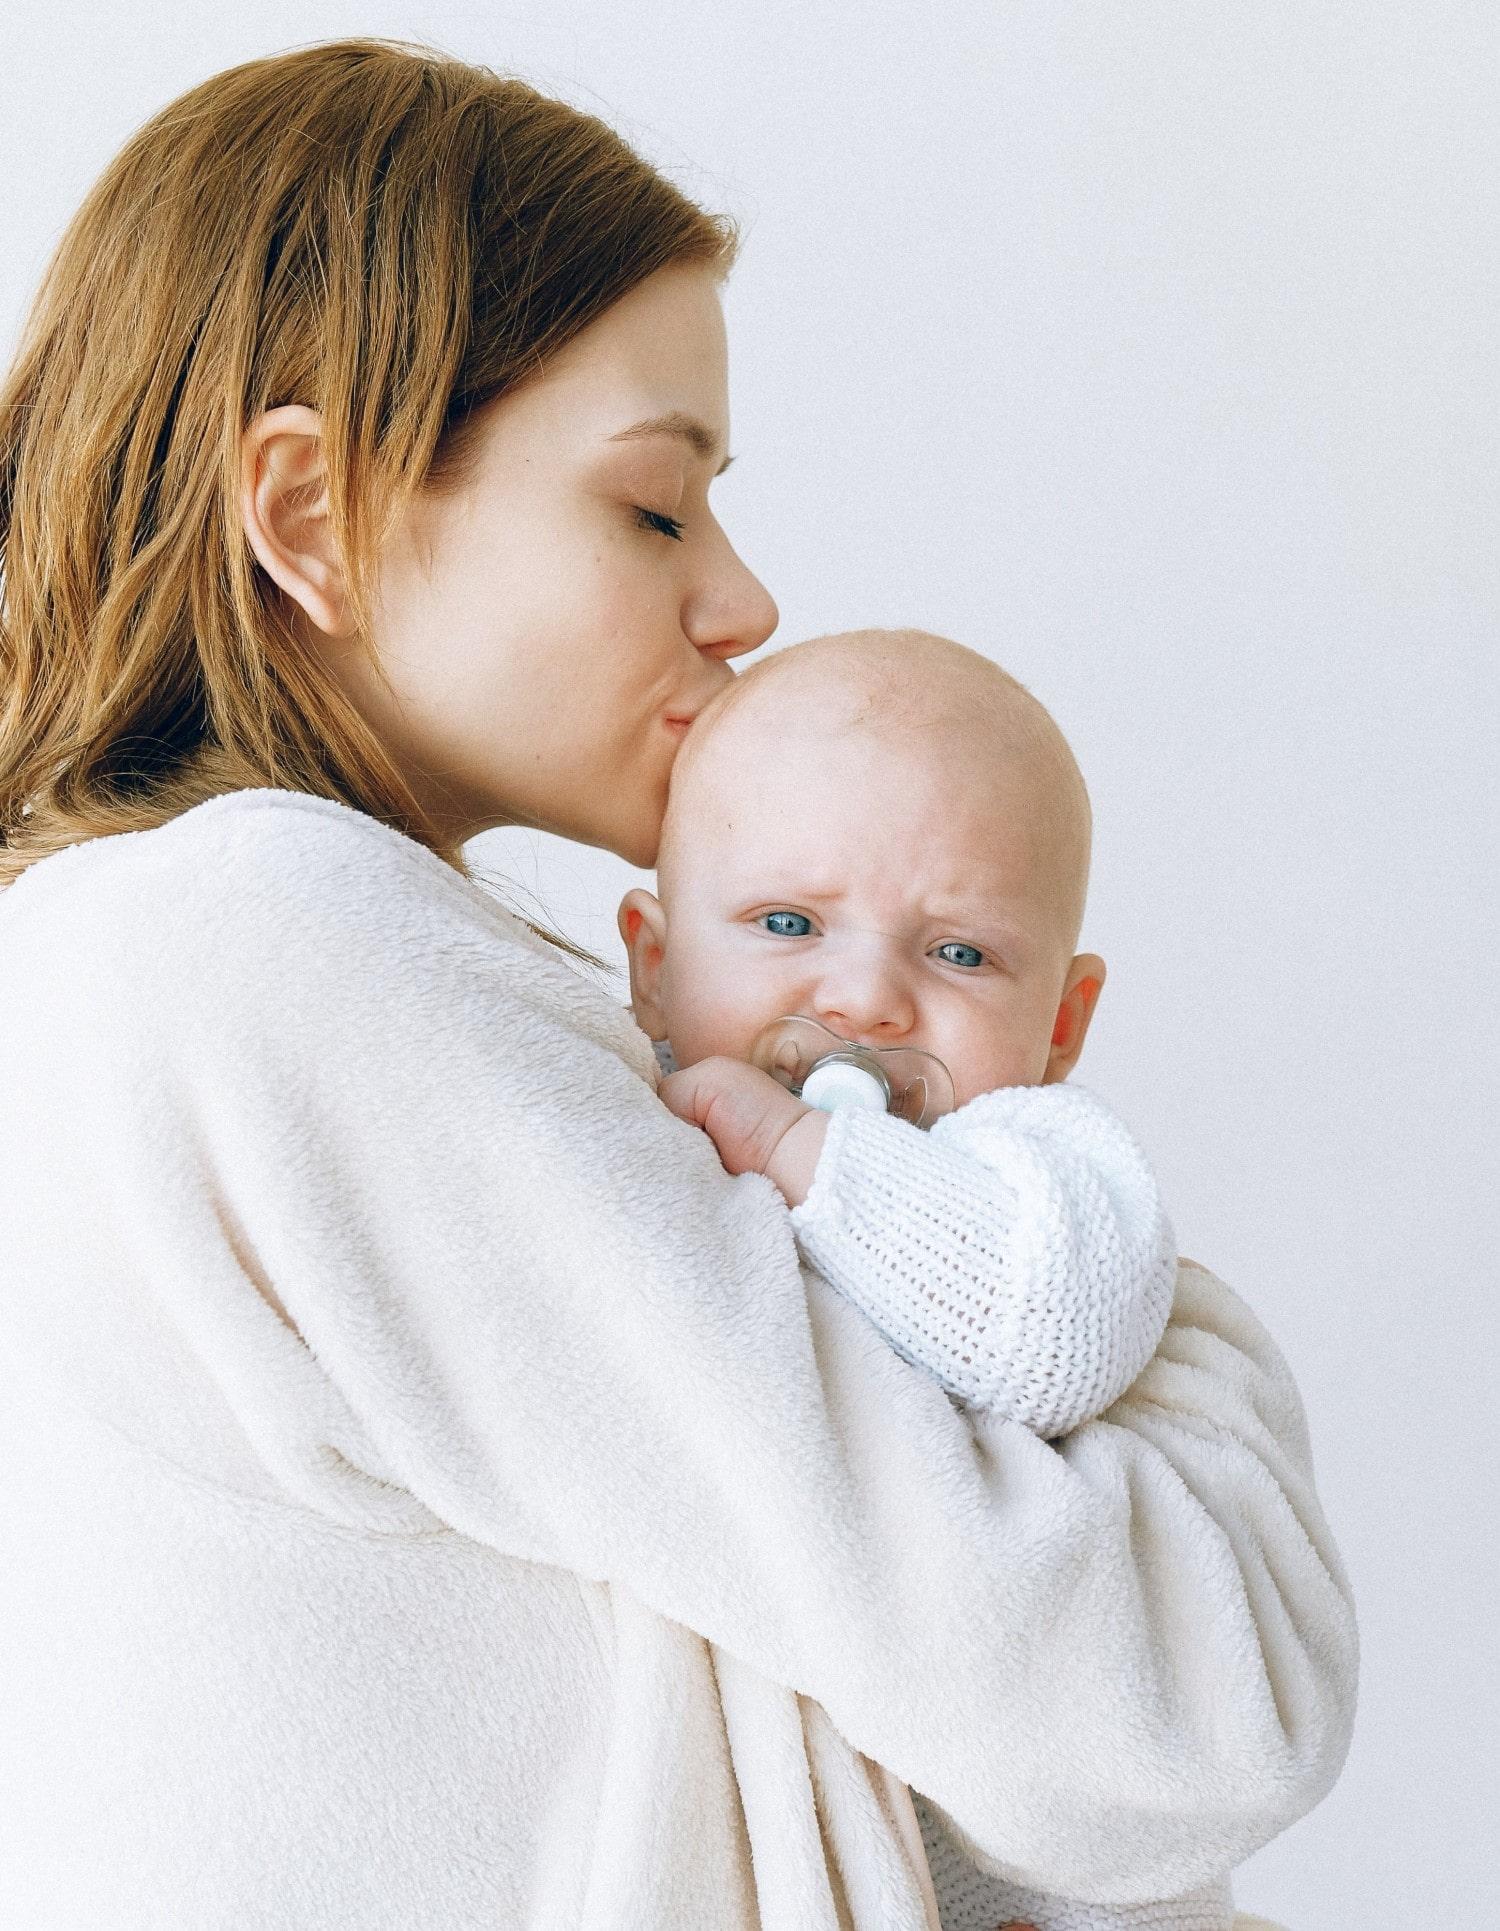 Влияет ли деформация головы на развитие ребенка? - Ортотис Премиум